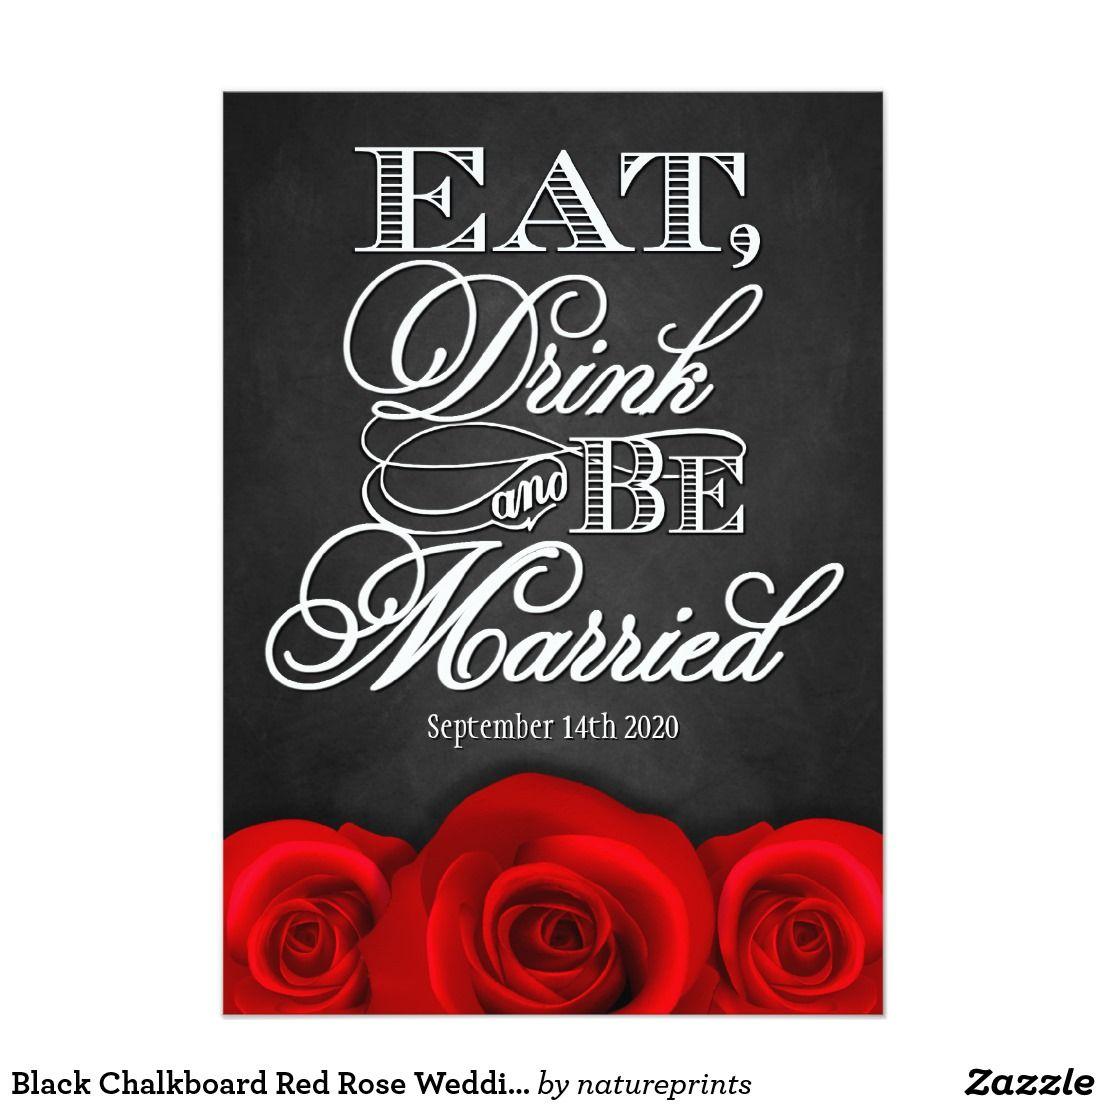 Black Chalkboard Red Rose Wedding Invitations Black Chalkboard